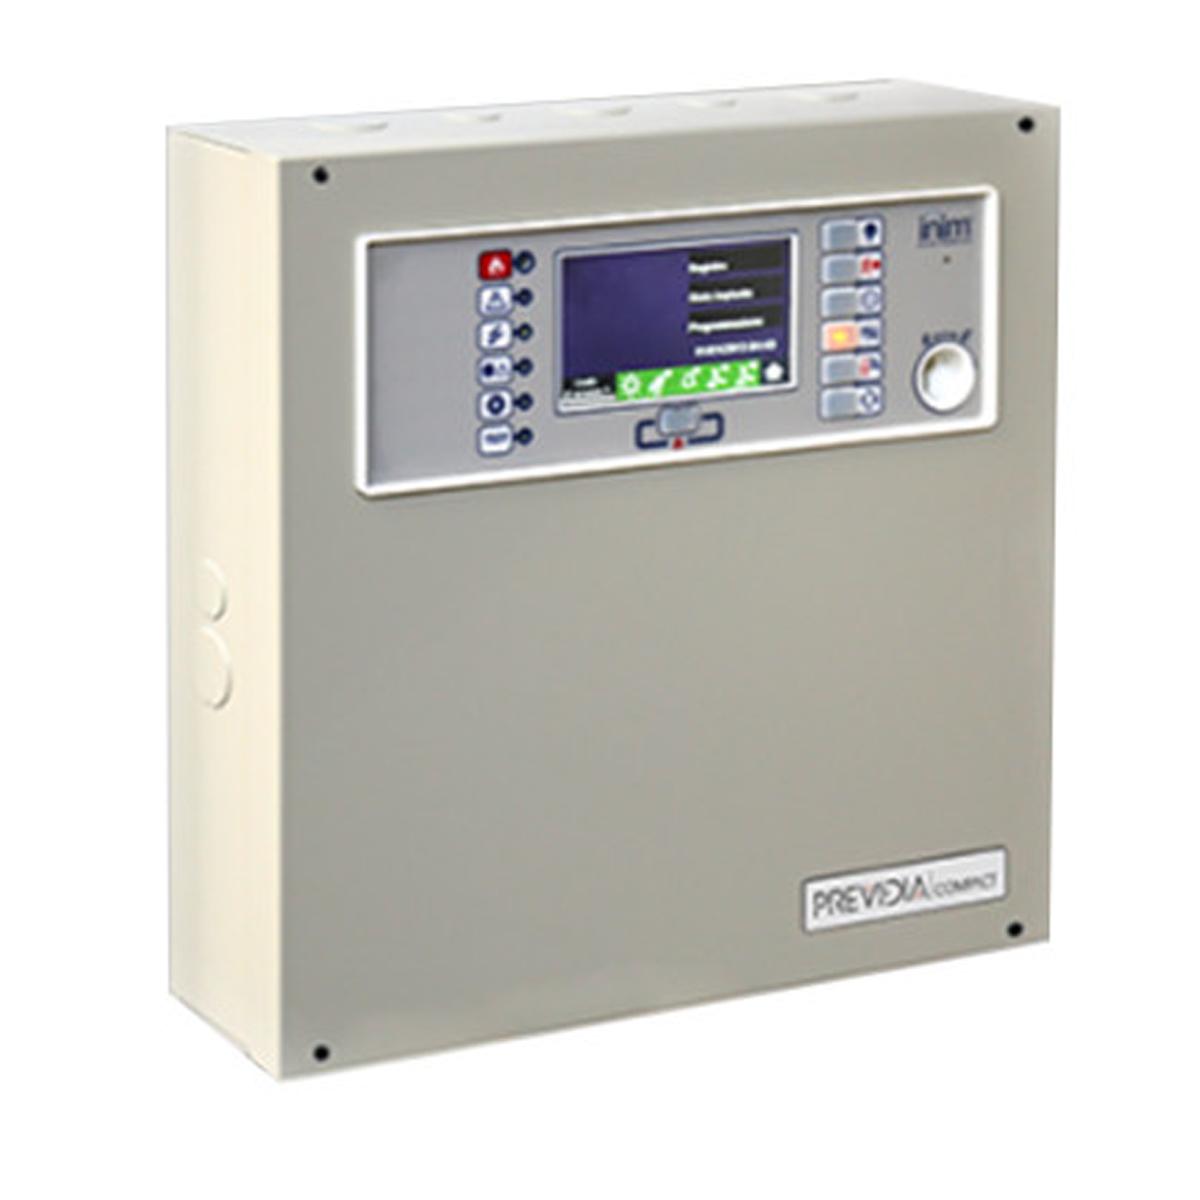 PREVIDIA Compact 2 Loop C200SG